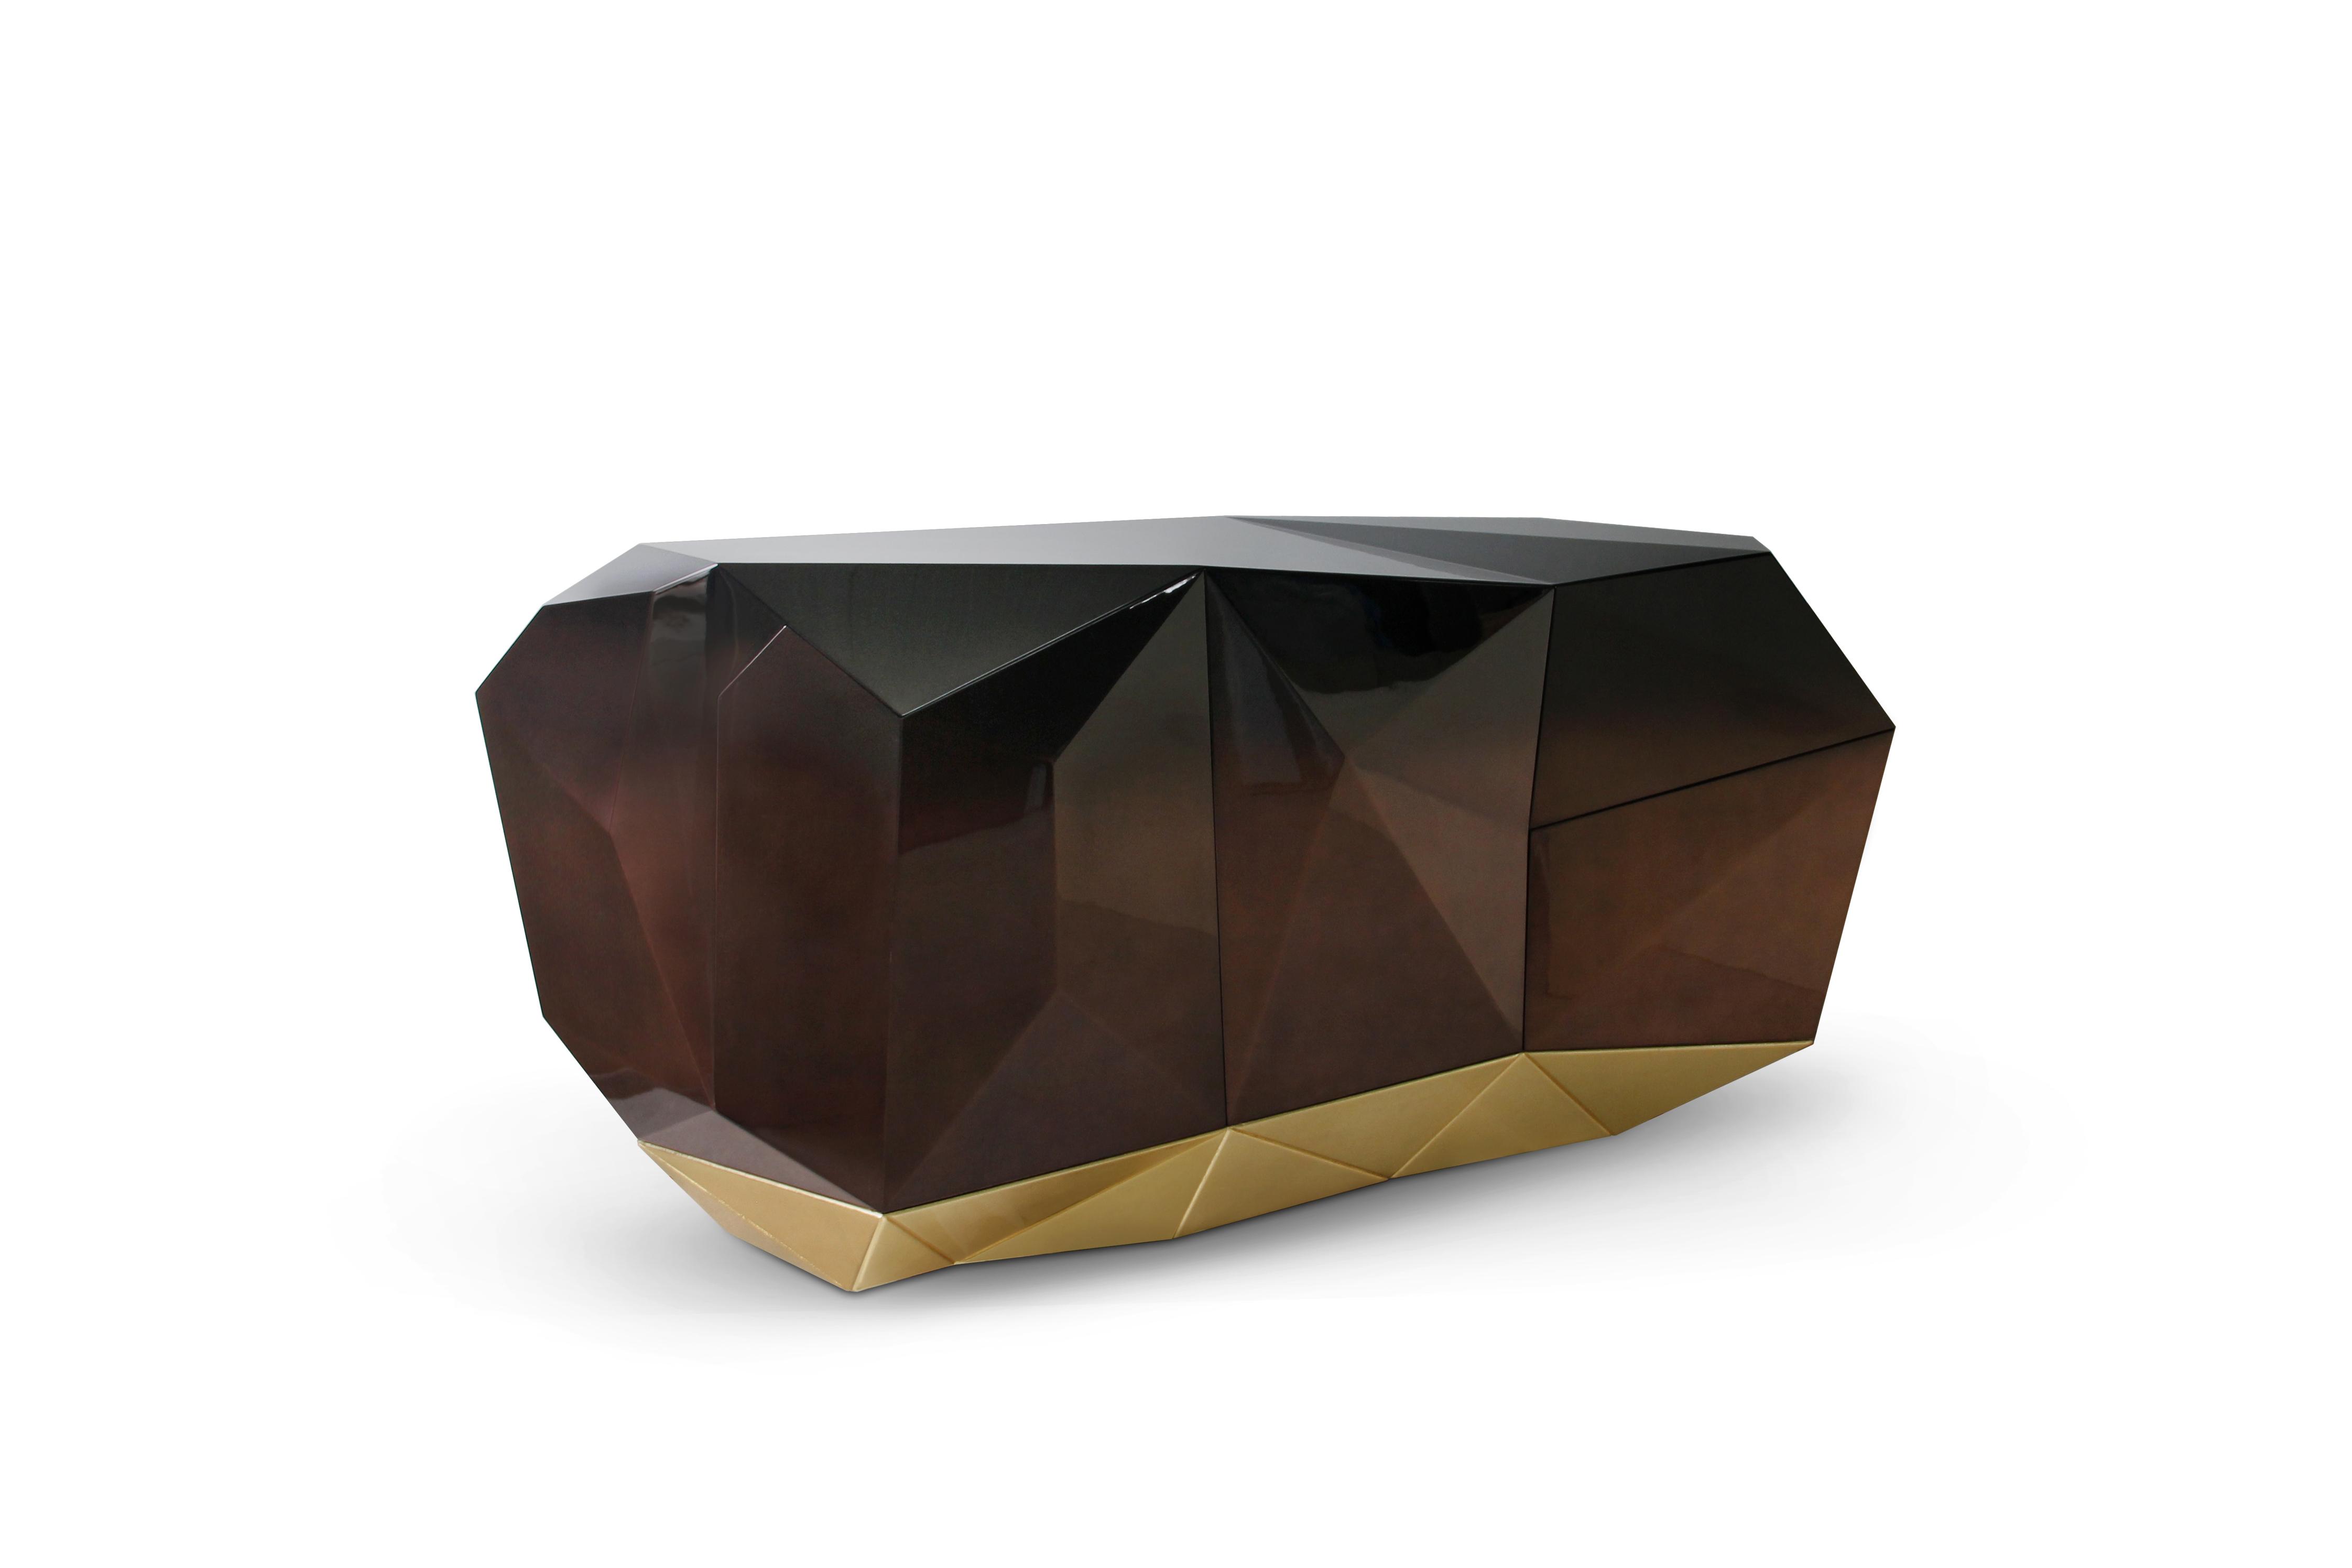 creative buffets Get to know Creative Buffets by Boca do Lobo diamond chocolate sideboard boca do lobo 01